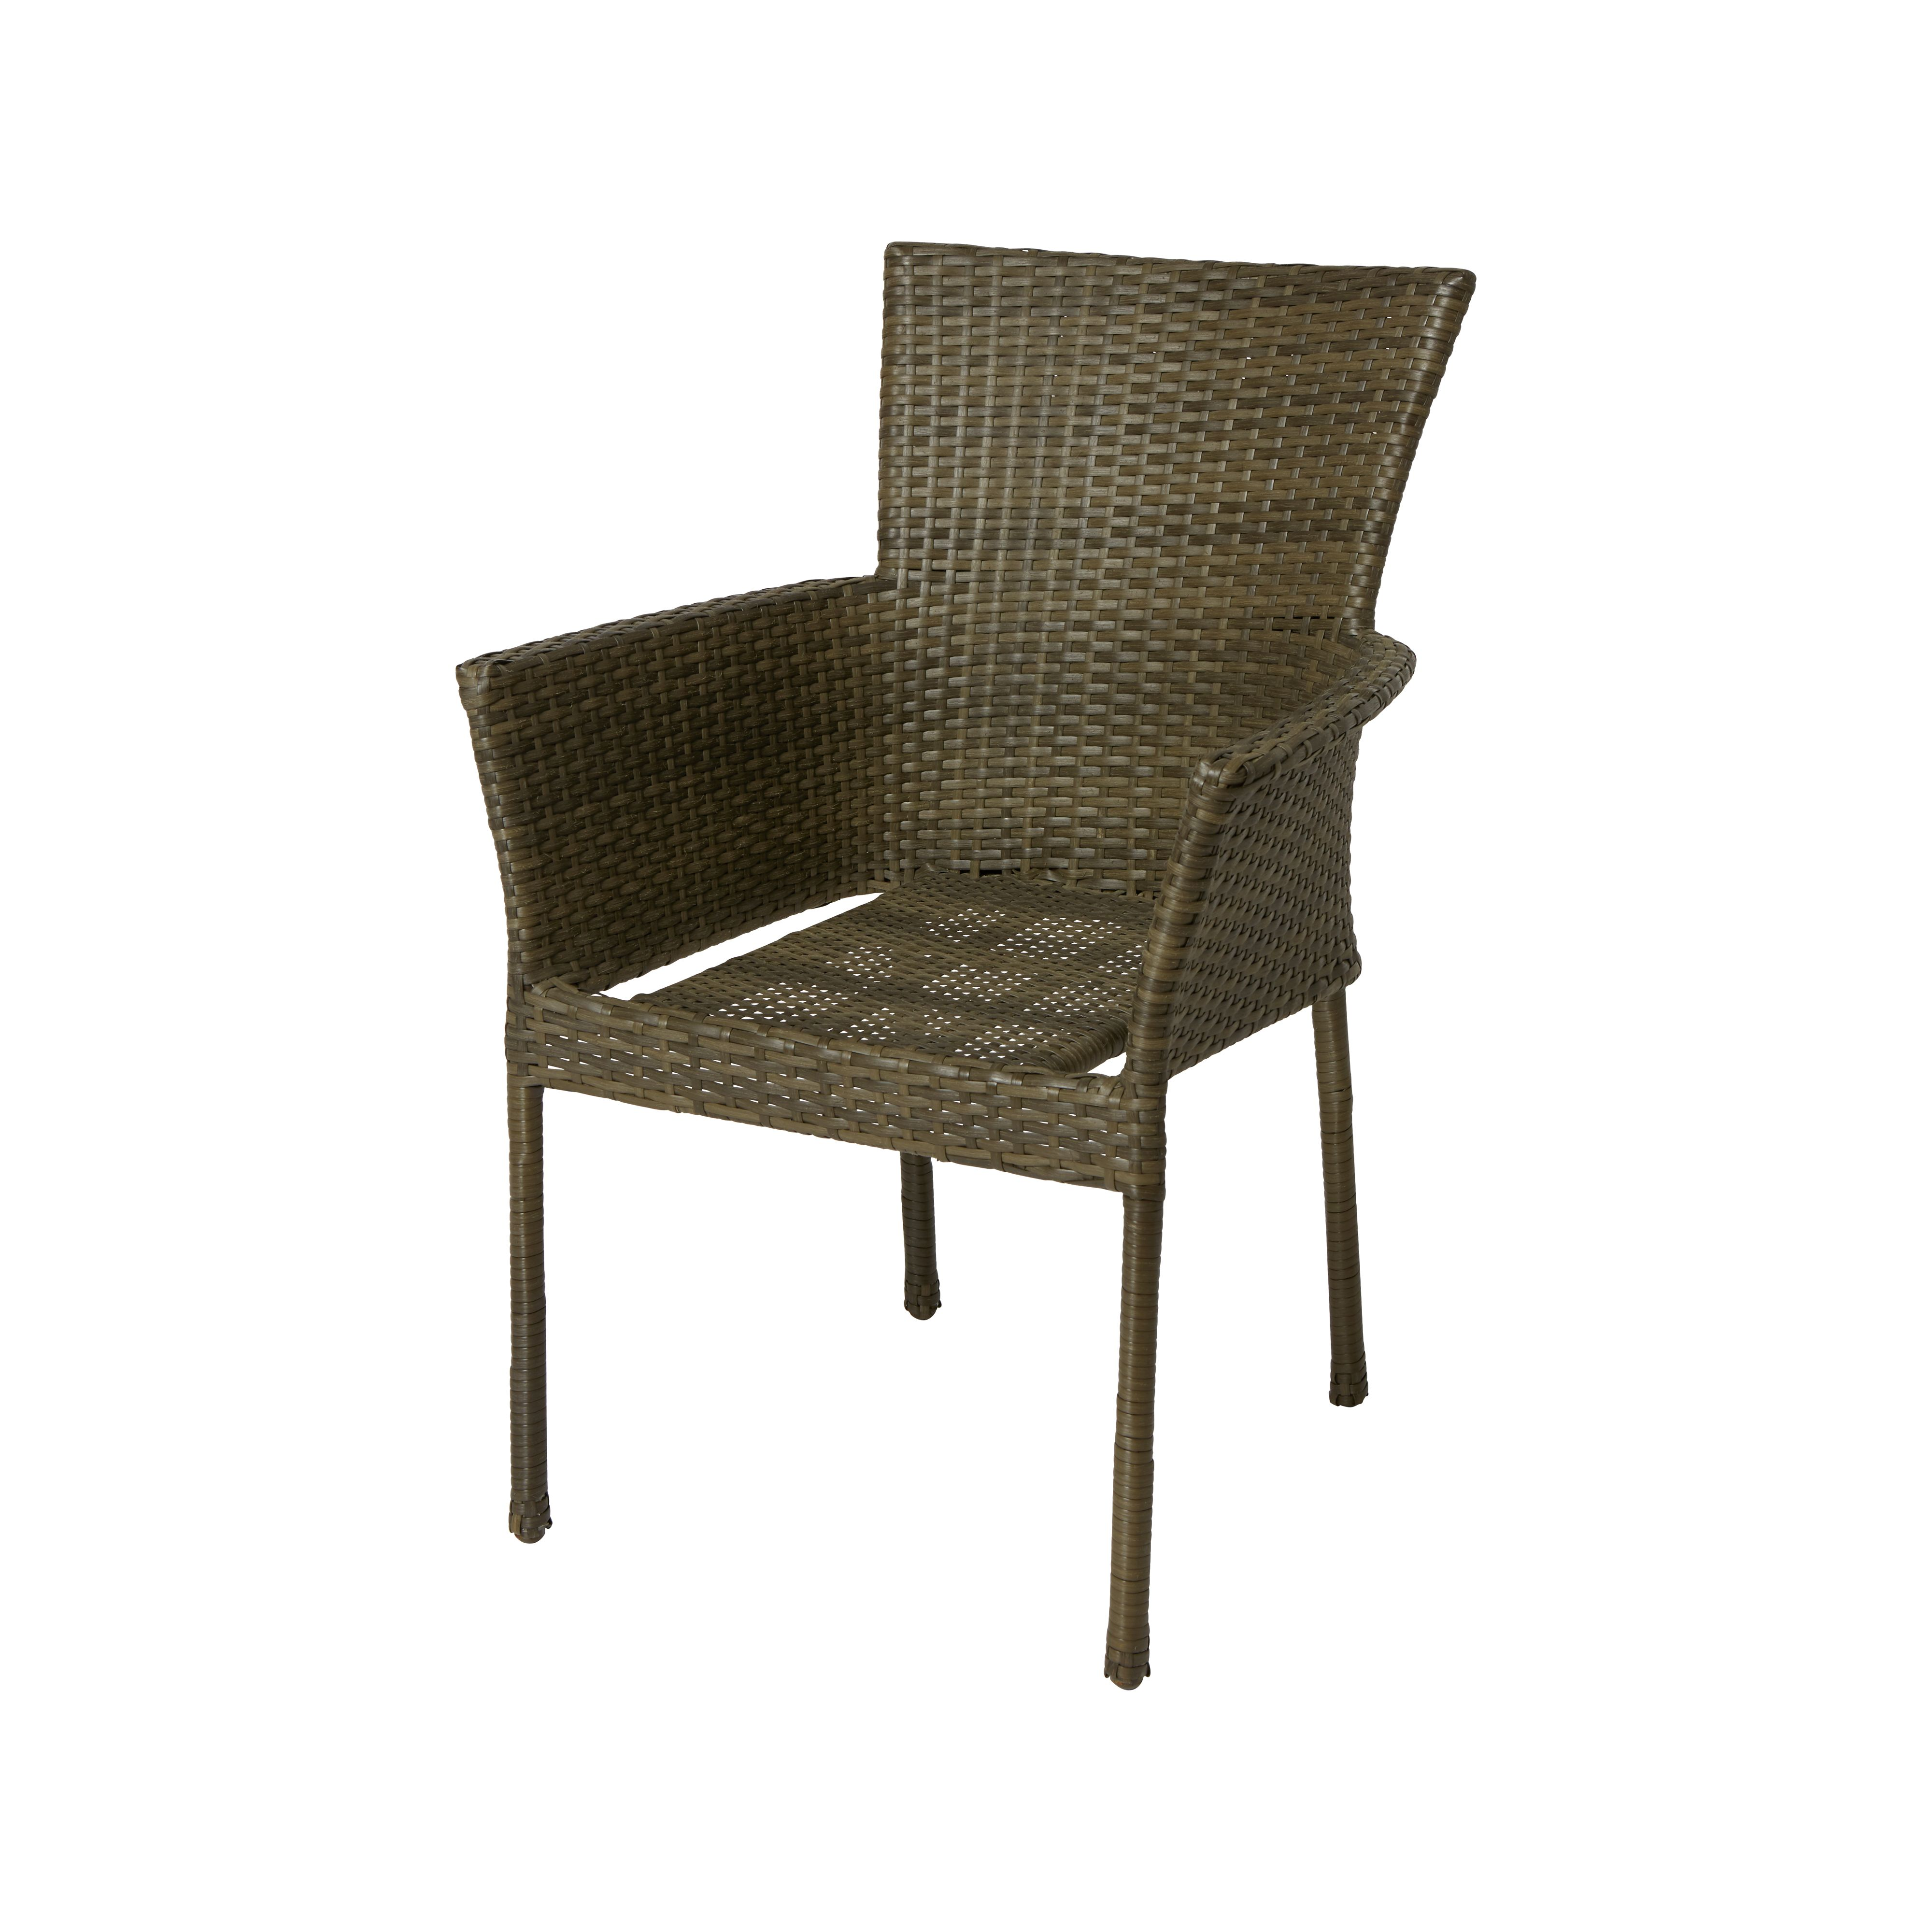 Mali Rattan Effect 6 Seater Garden Furniture Set - Brown & Cream